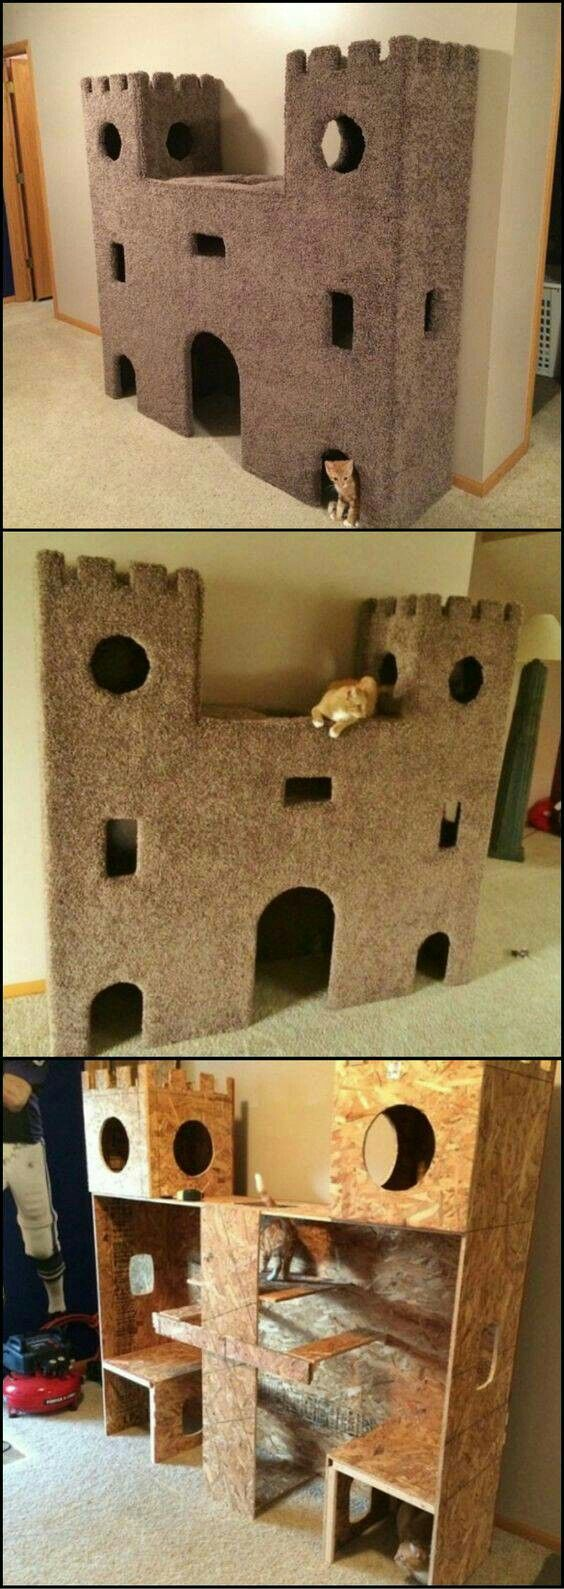 mer enn 25 bra ideer om katzenspielzeug selber bauen på pinterest, Gartenarbeit ideen